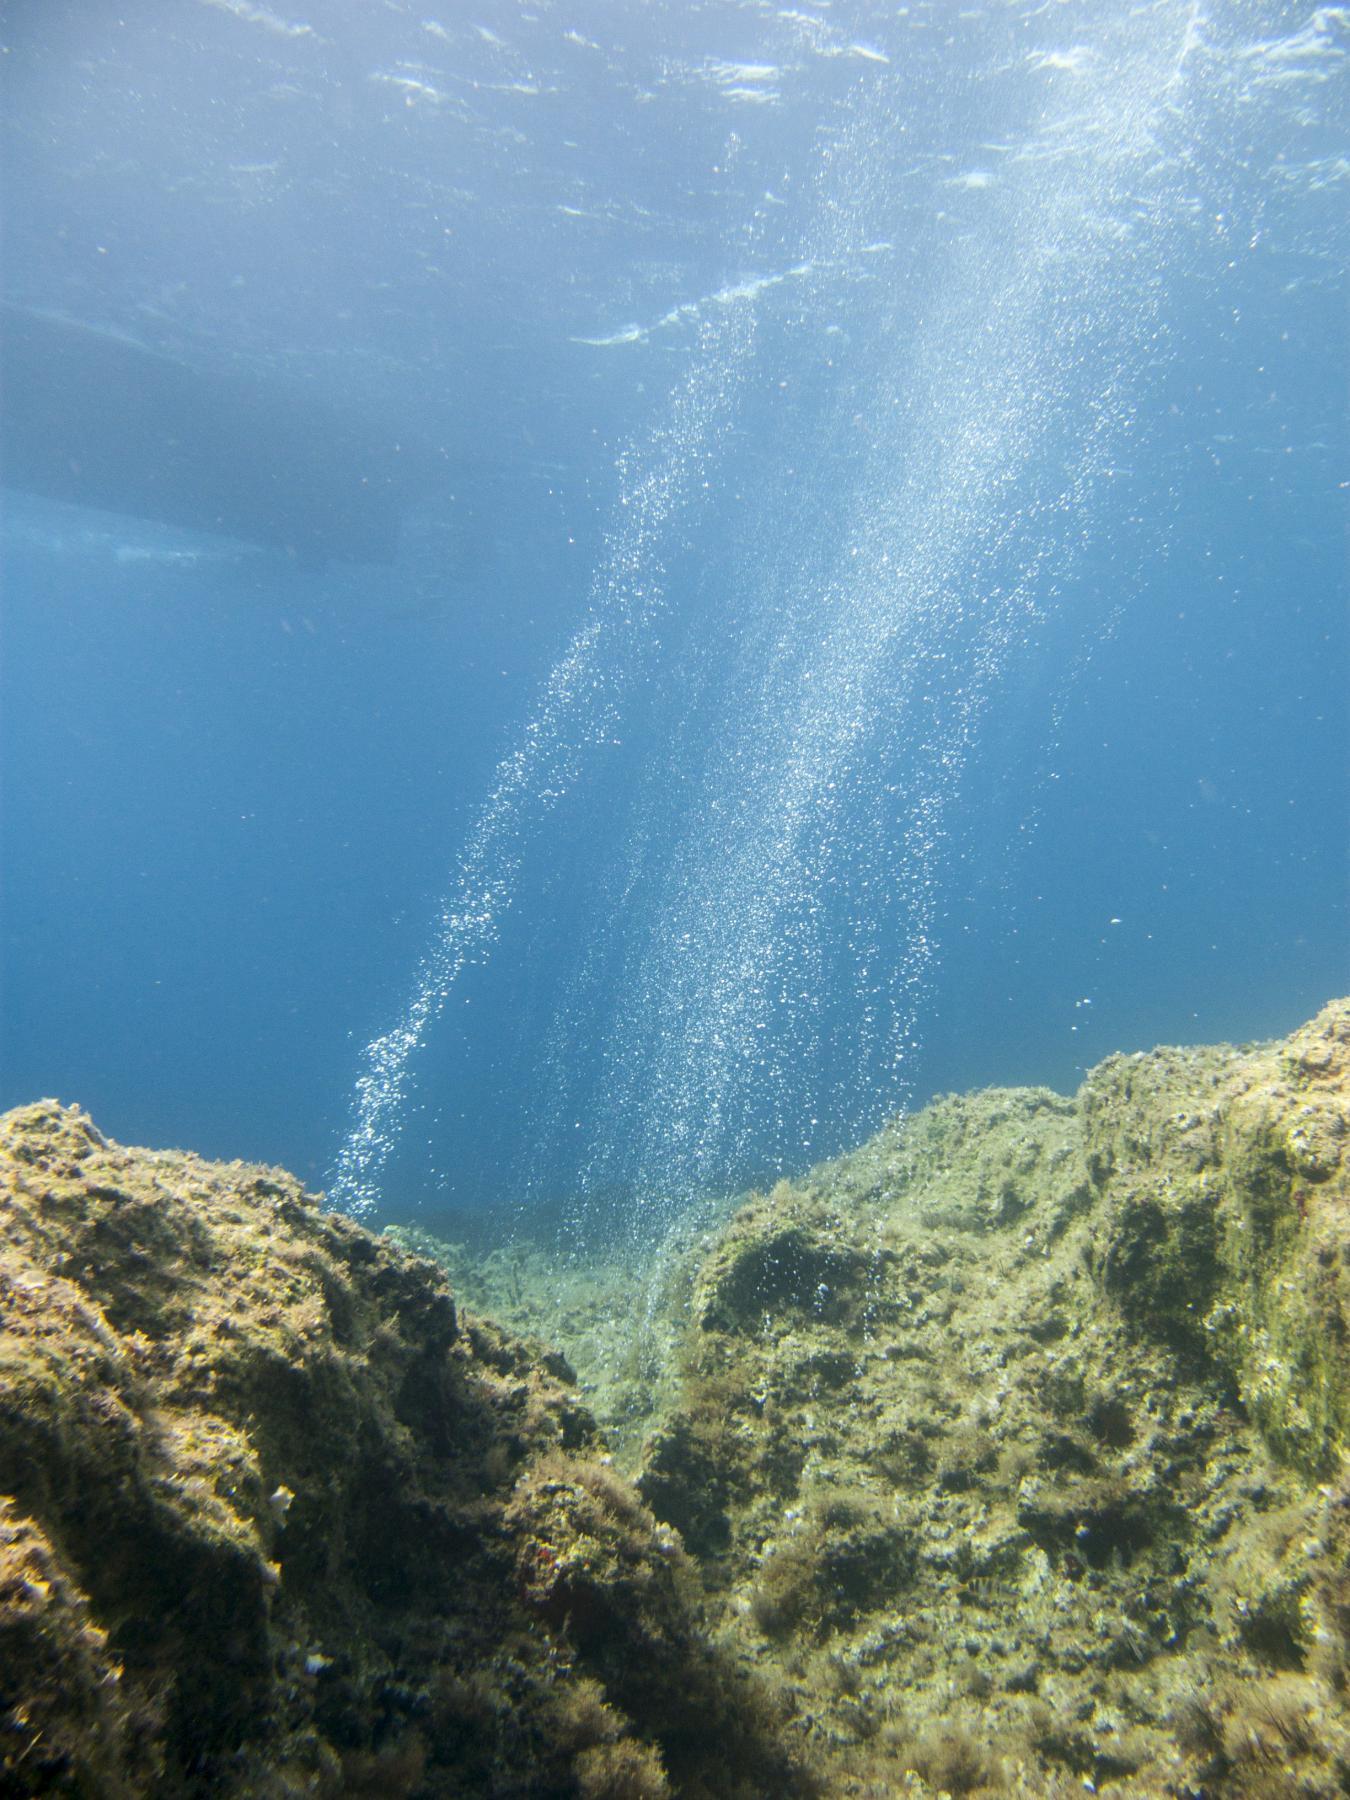 Bubbles at Lantern Point